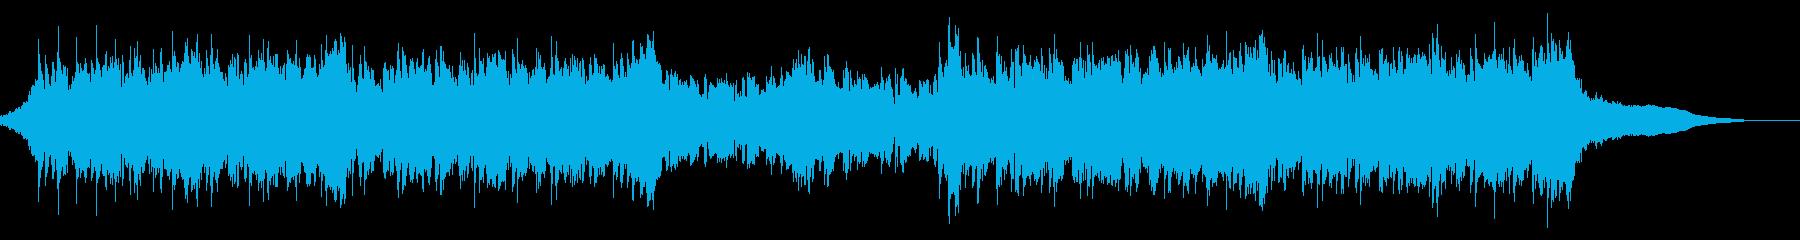 texture19の再生済みの波形